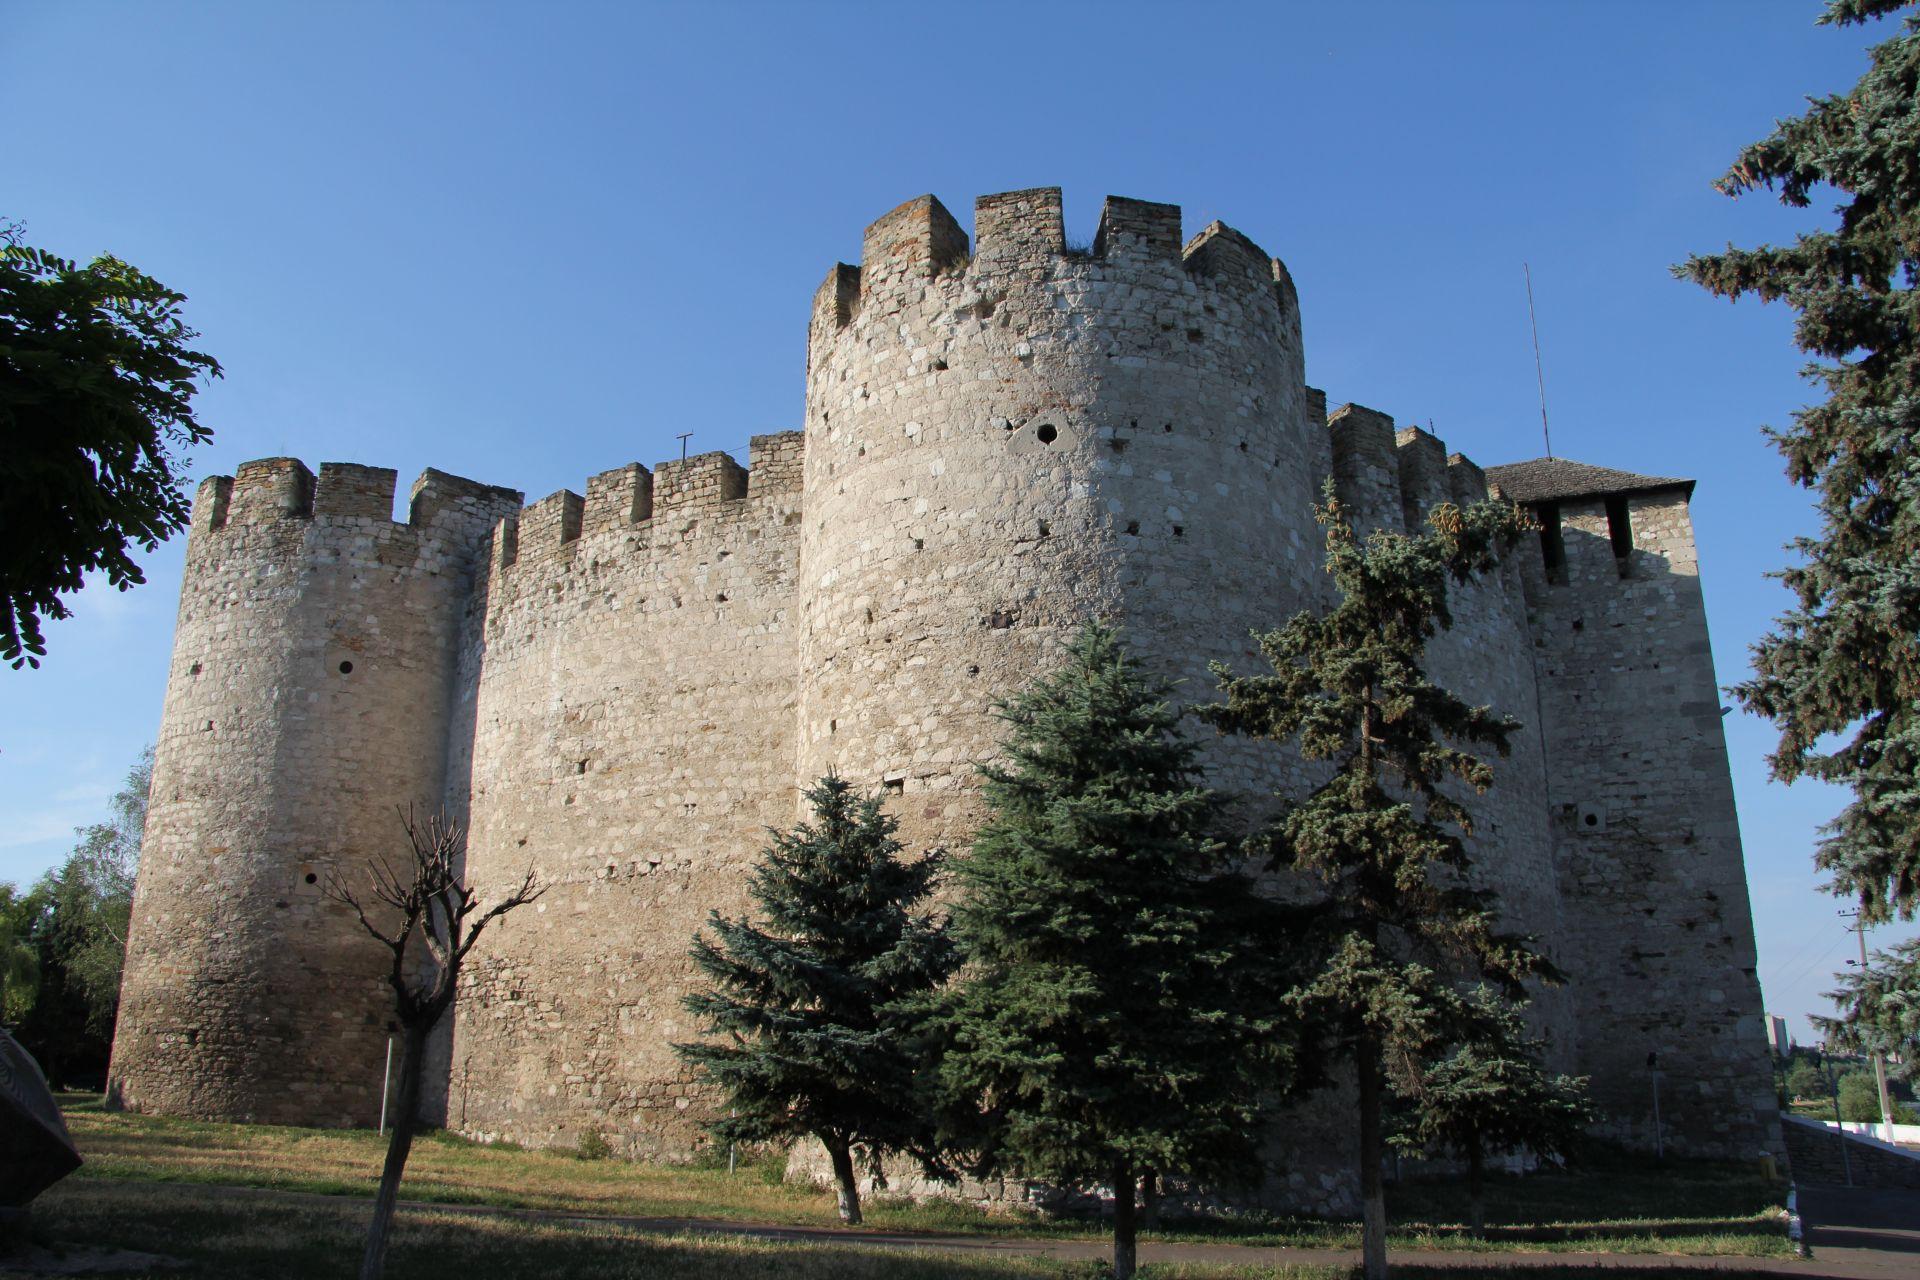 Cahul Moldova  city images : lev tolstoi str 4 cahul moldova and phone 373 299 21 471 gsm 373 0 681 ...